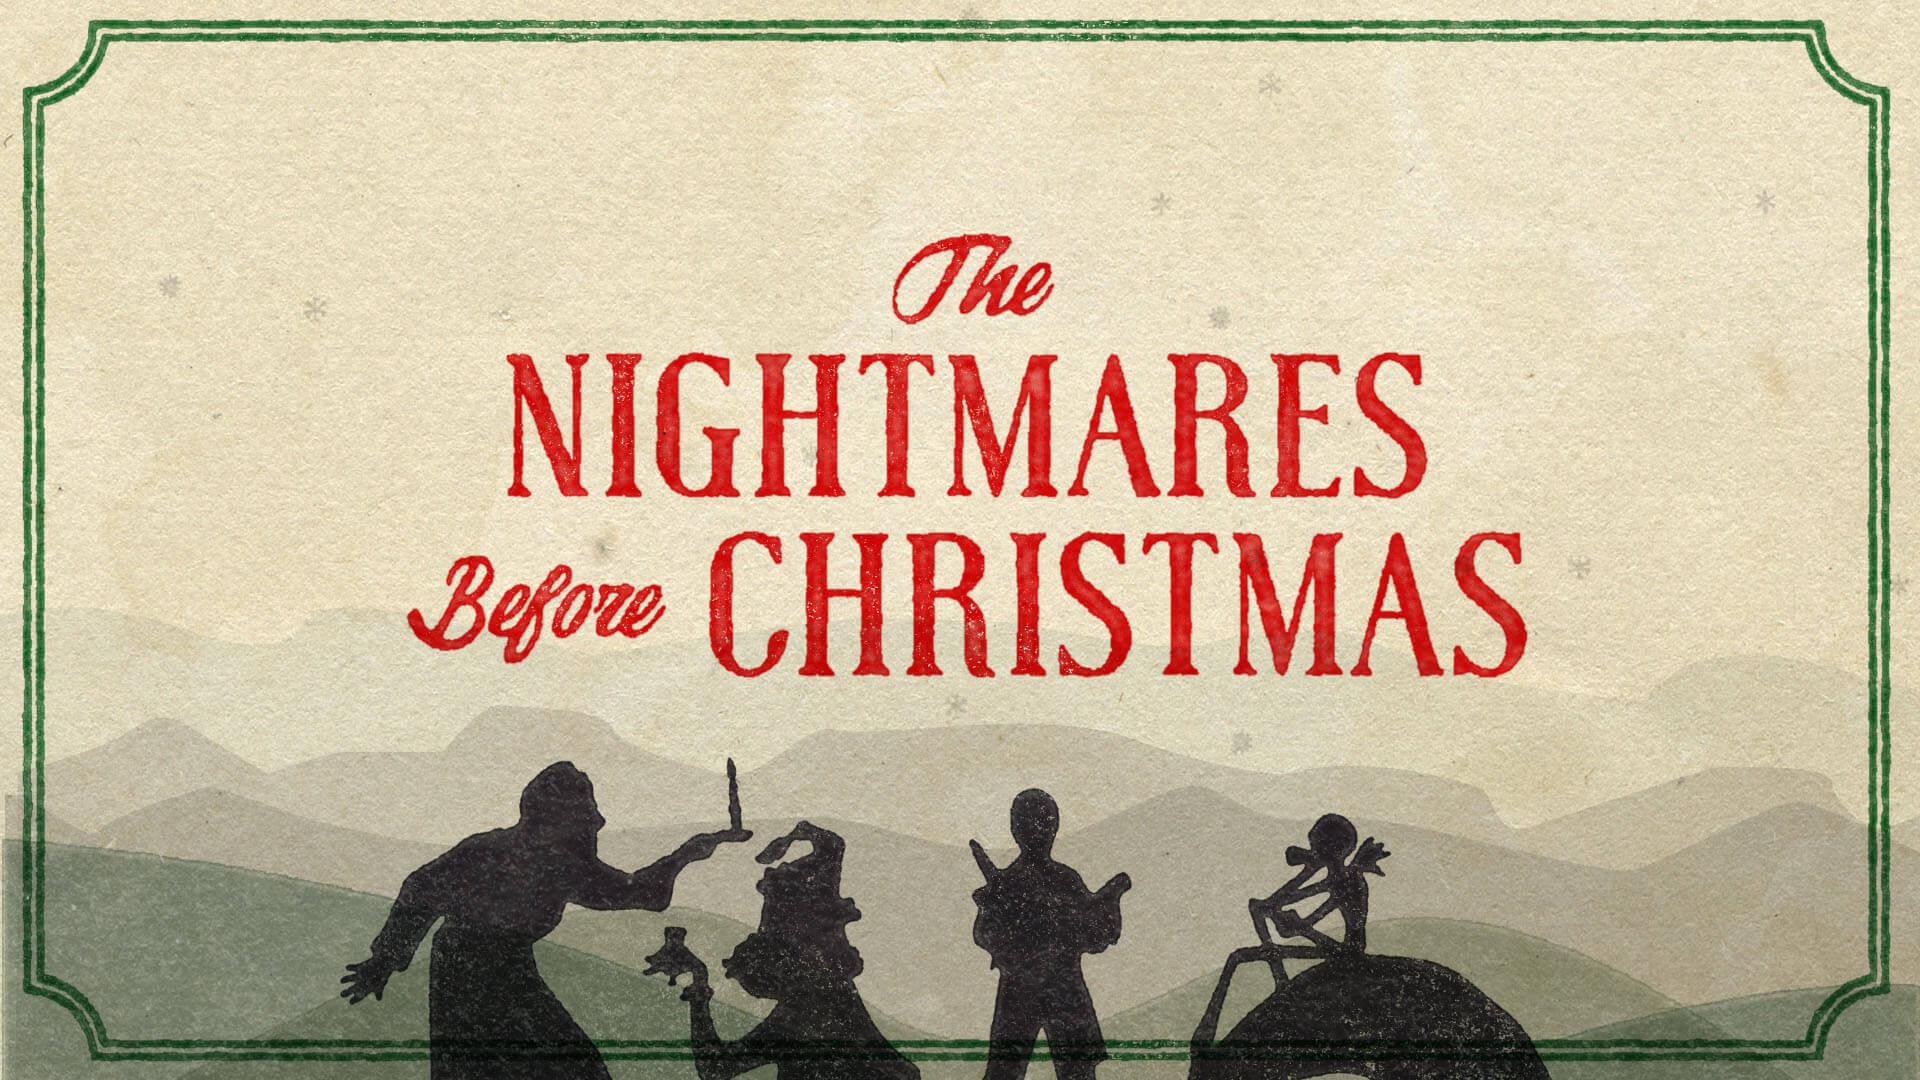 Nightmares_Before_Christmas_Branding_Title